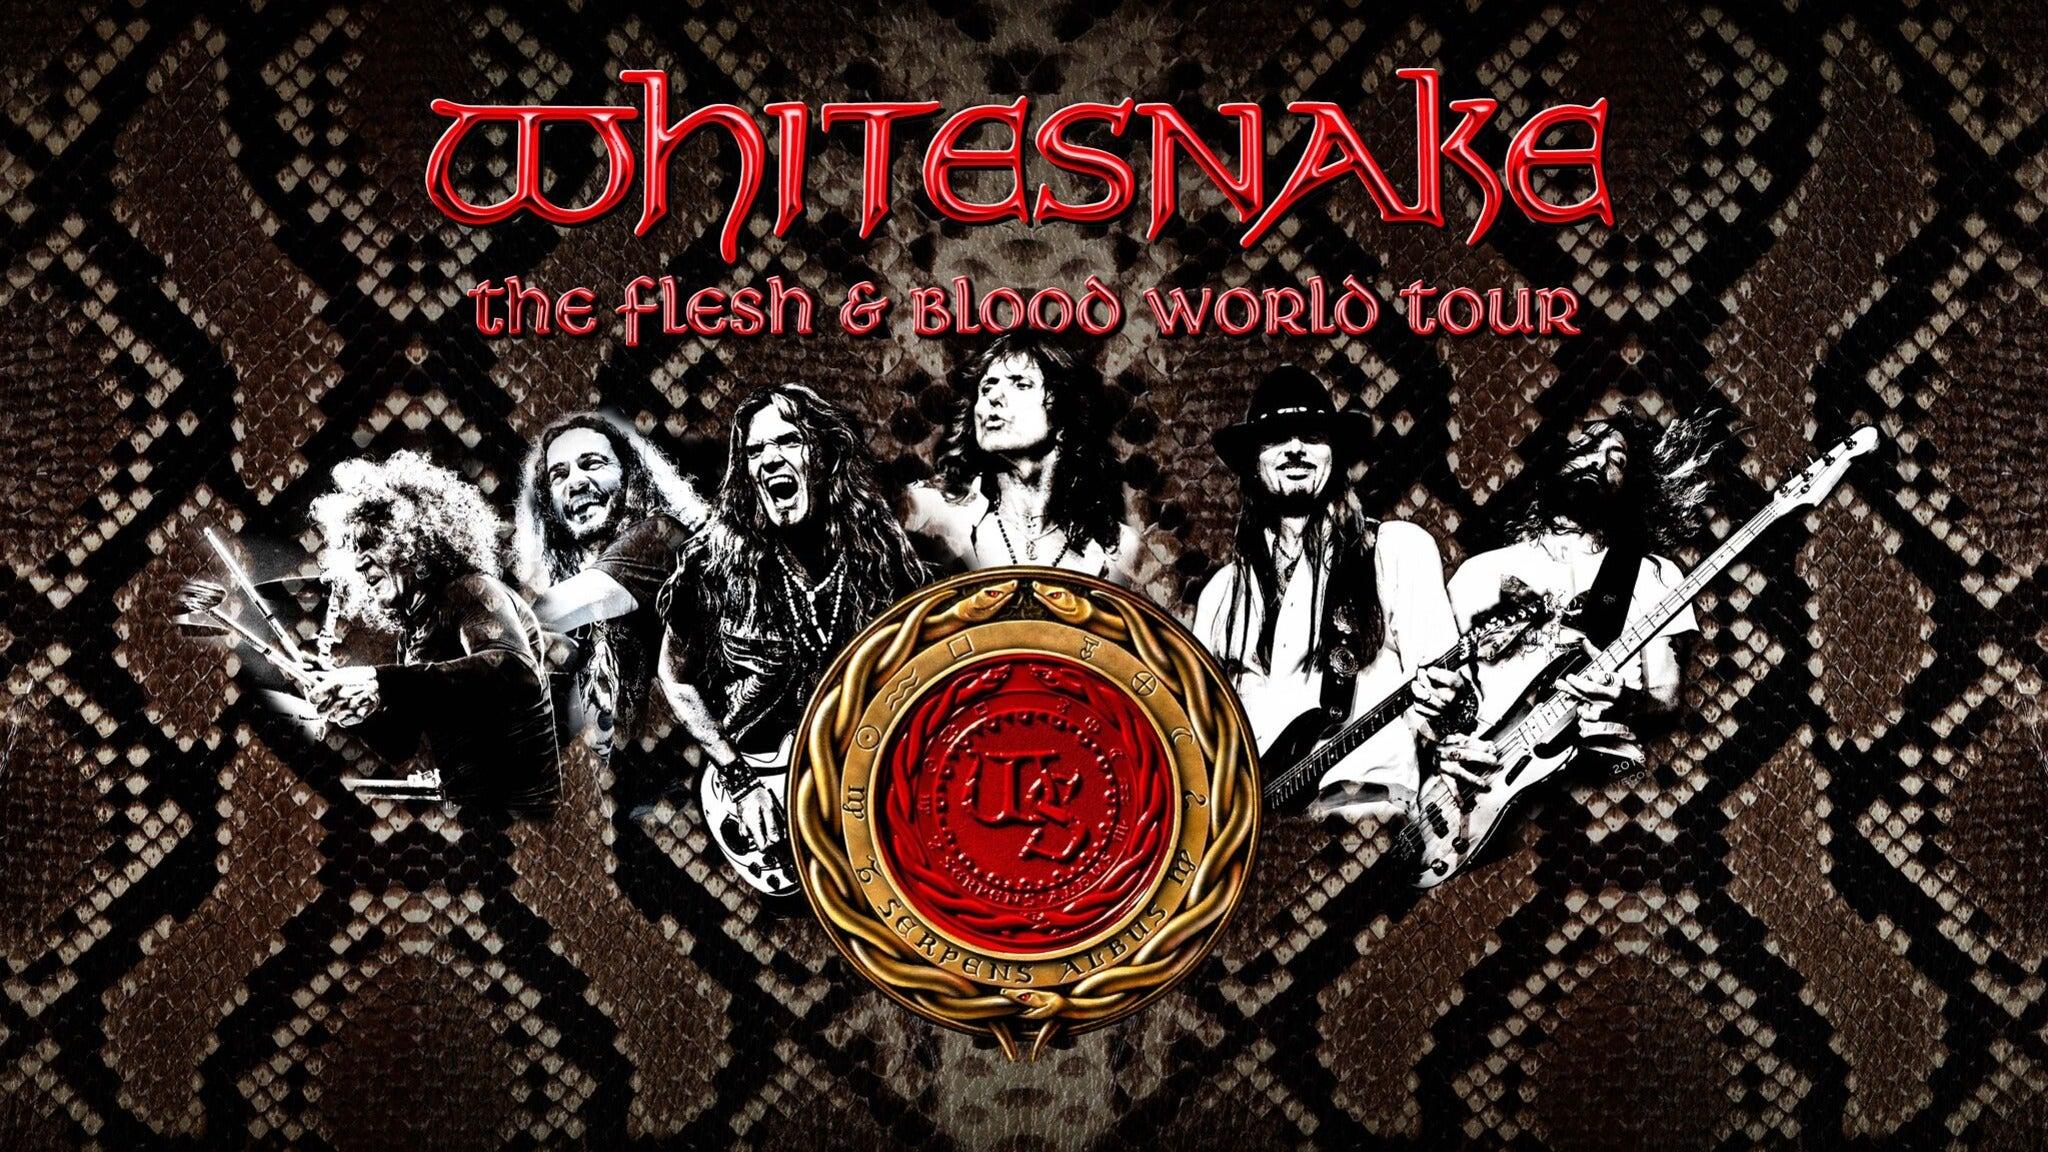 Whitesnake at STATE BANK AMPHITHEATRE AT CHASTAIN PARK